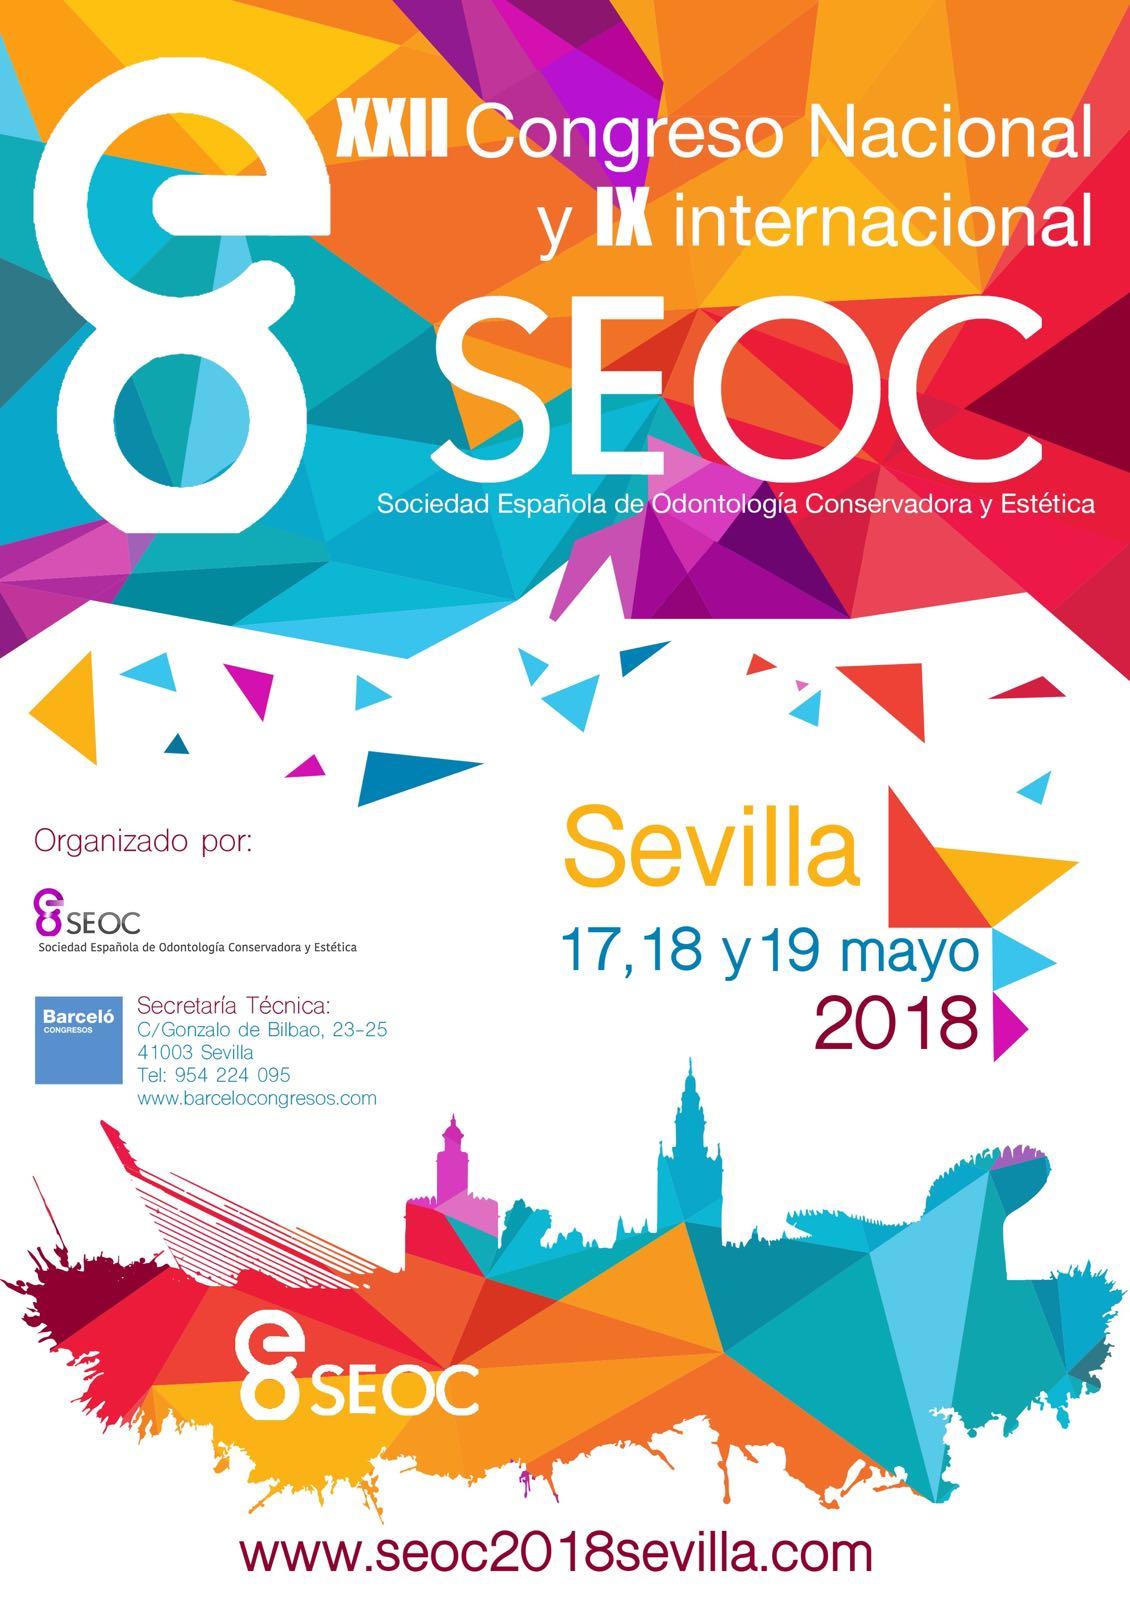 SEOC Sevilla 2018